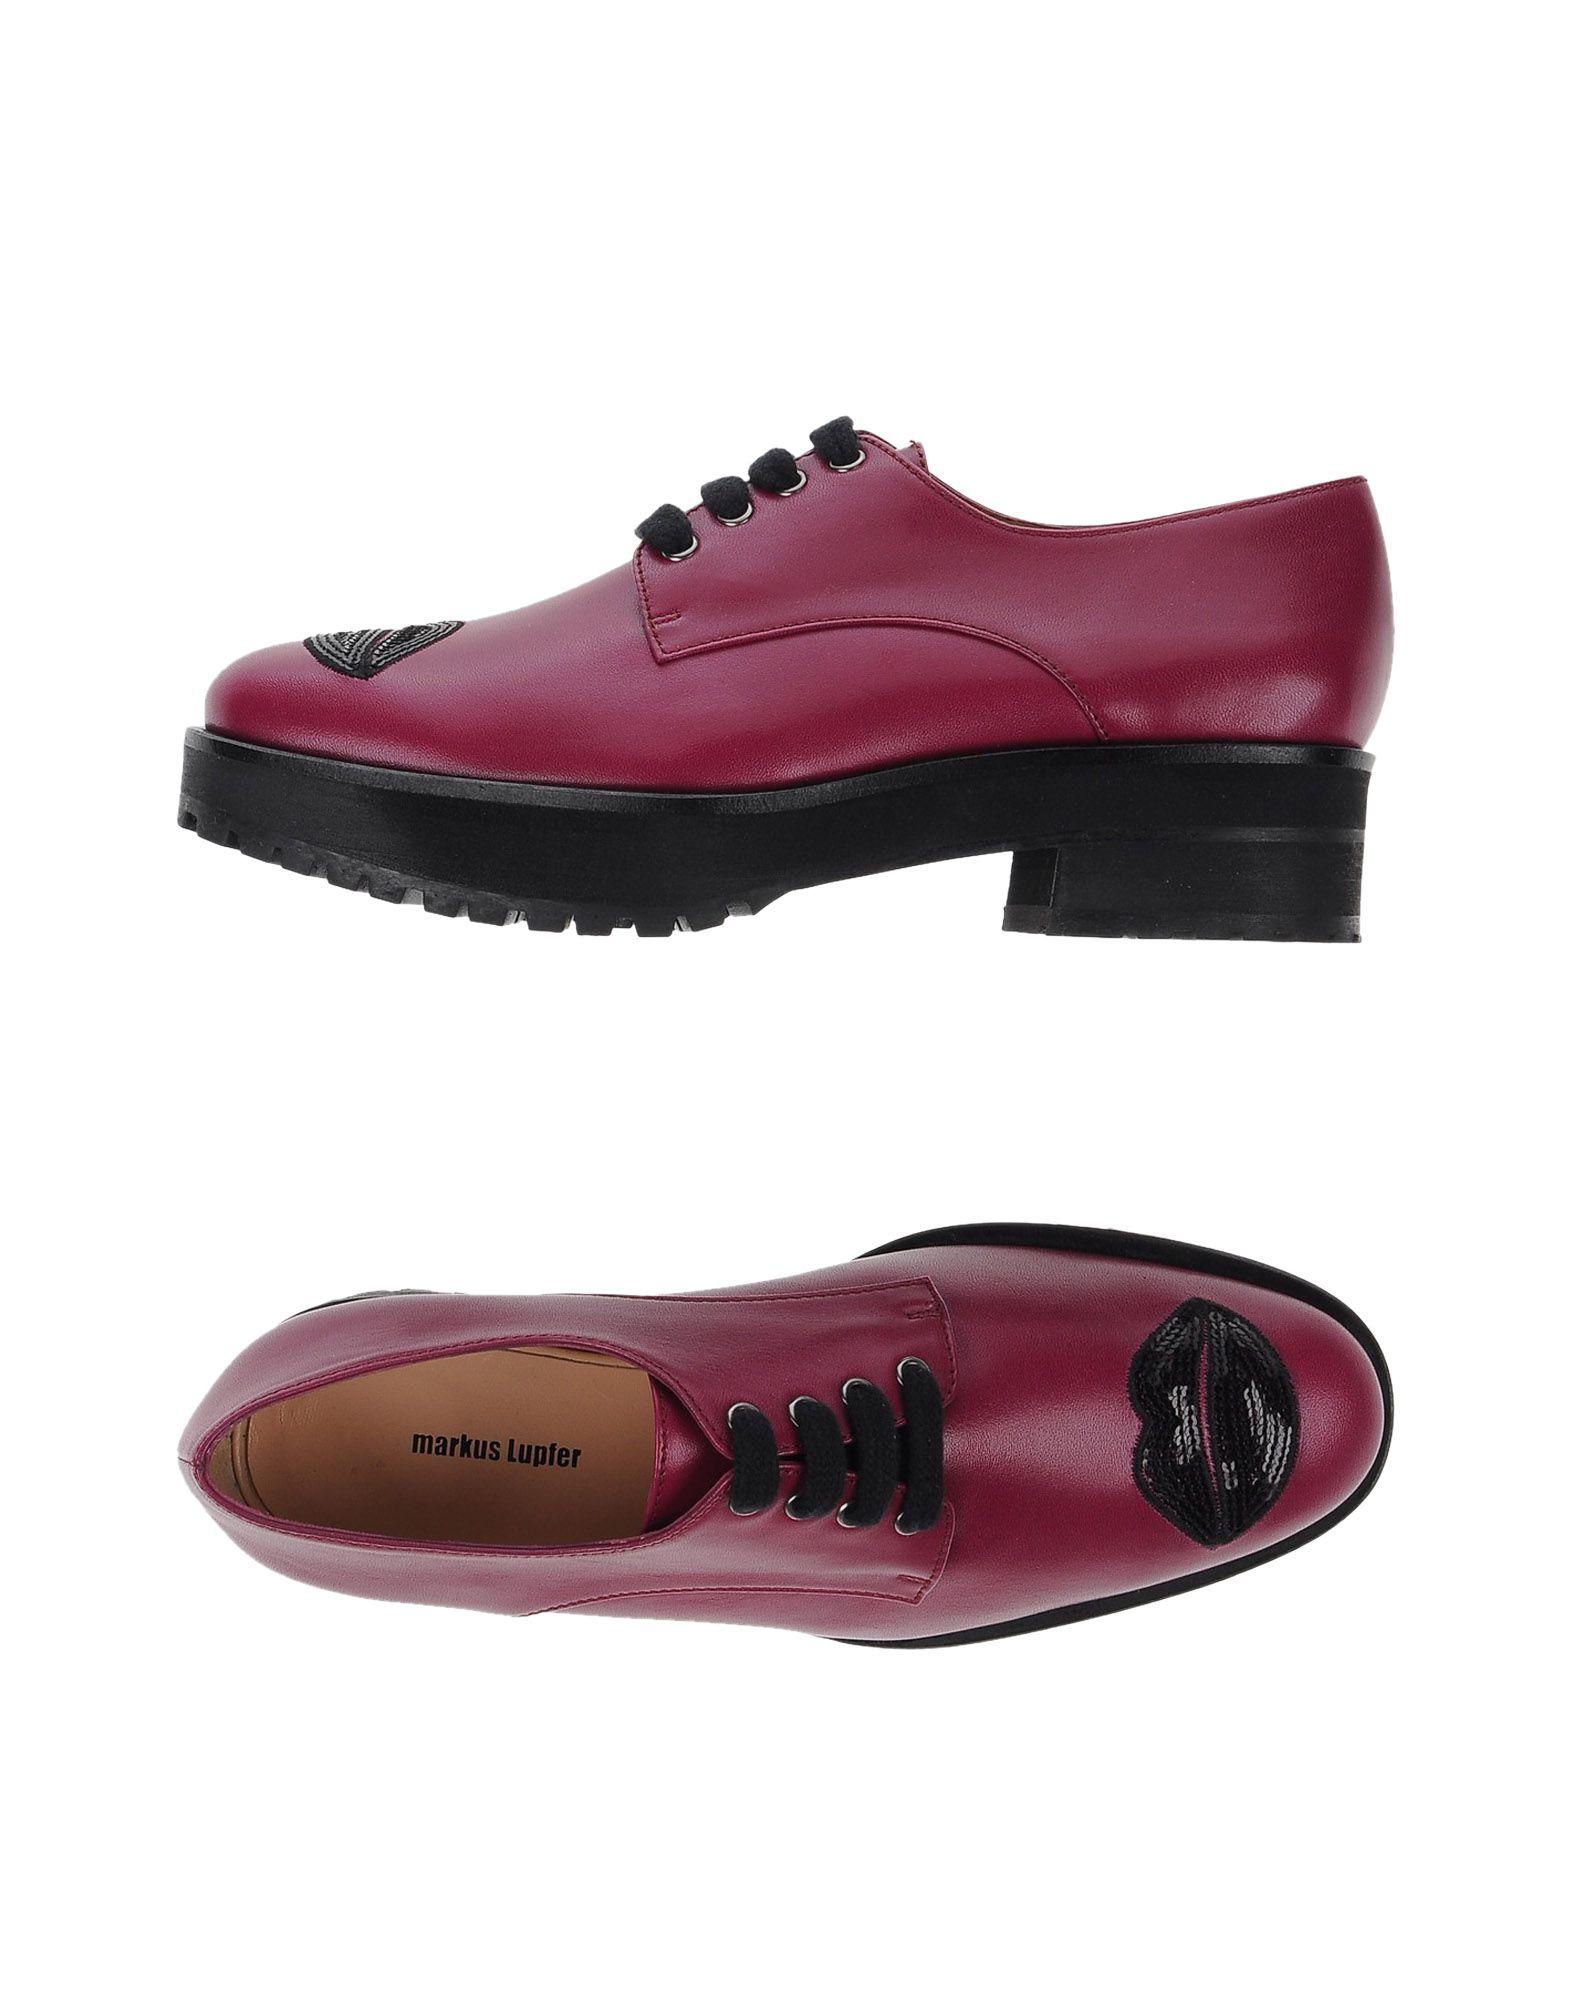 Фото - MARKUS LUPFER Обувь на шнурках обувь на высокой платформе dkny